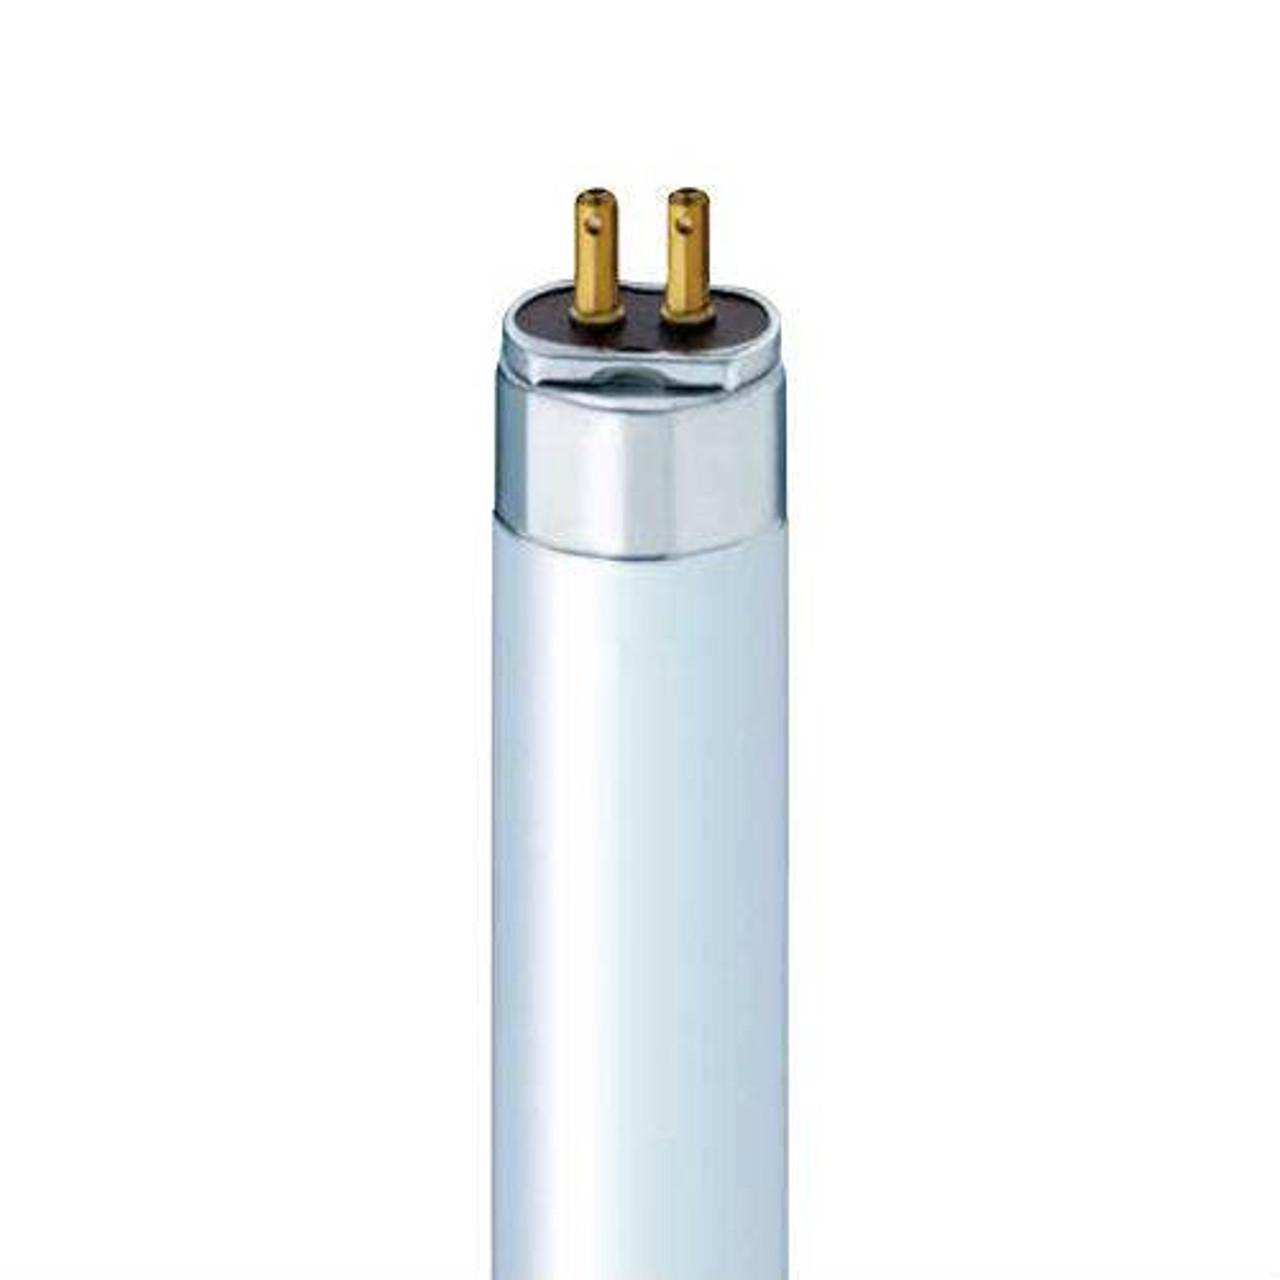 GE 99653 GE228MVPSH-A T5 Fluorescent Ballast